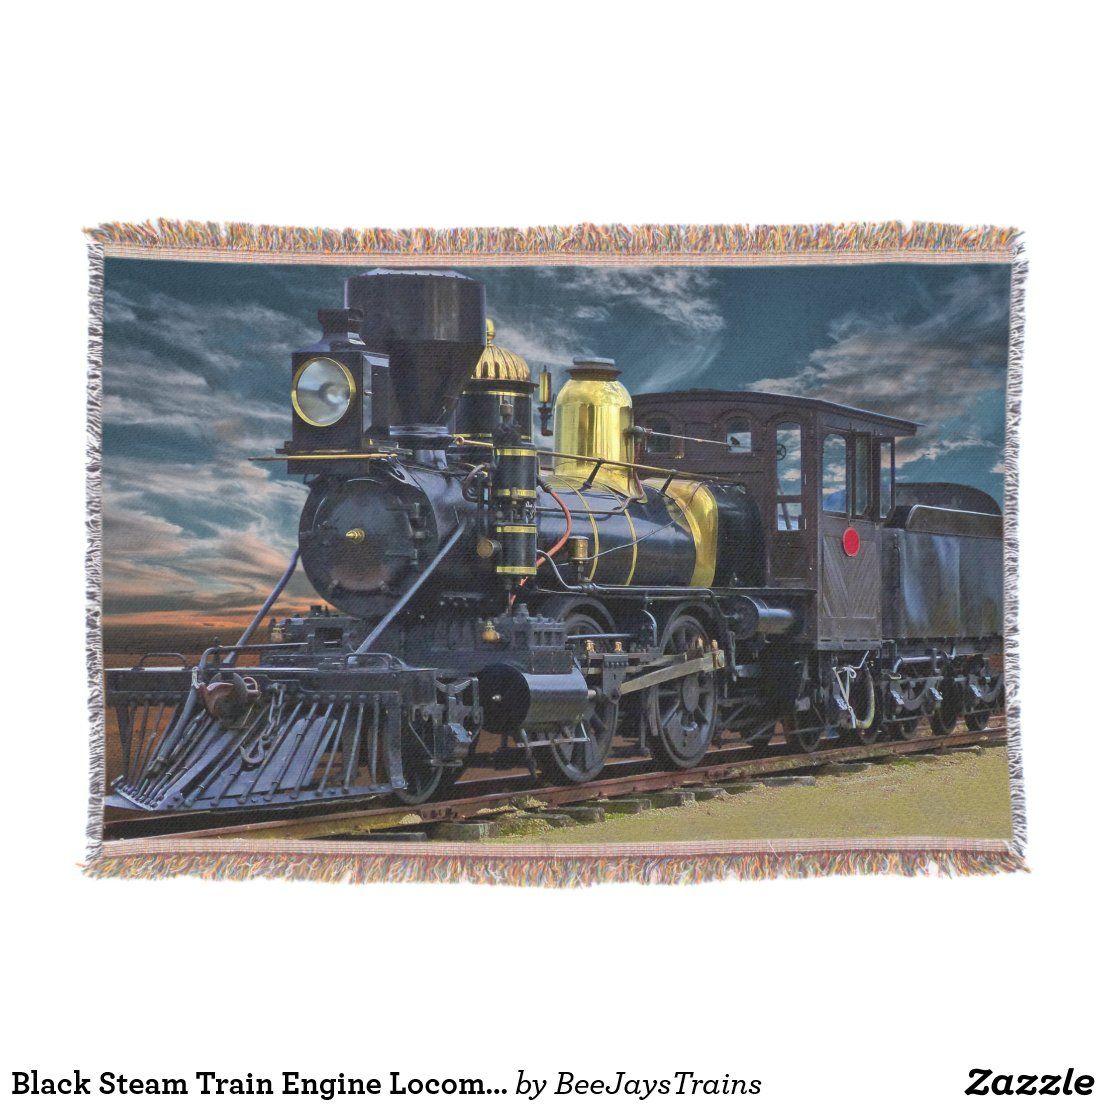 Black Steam Train Engine Locomotive Railroad Throw Blanket Zazzle Com Train Engines Locomotive Steam Trains